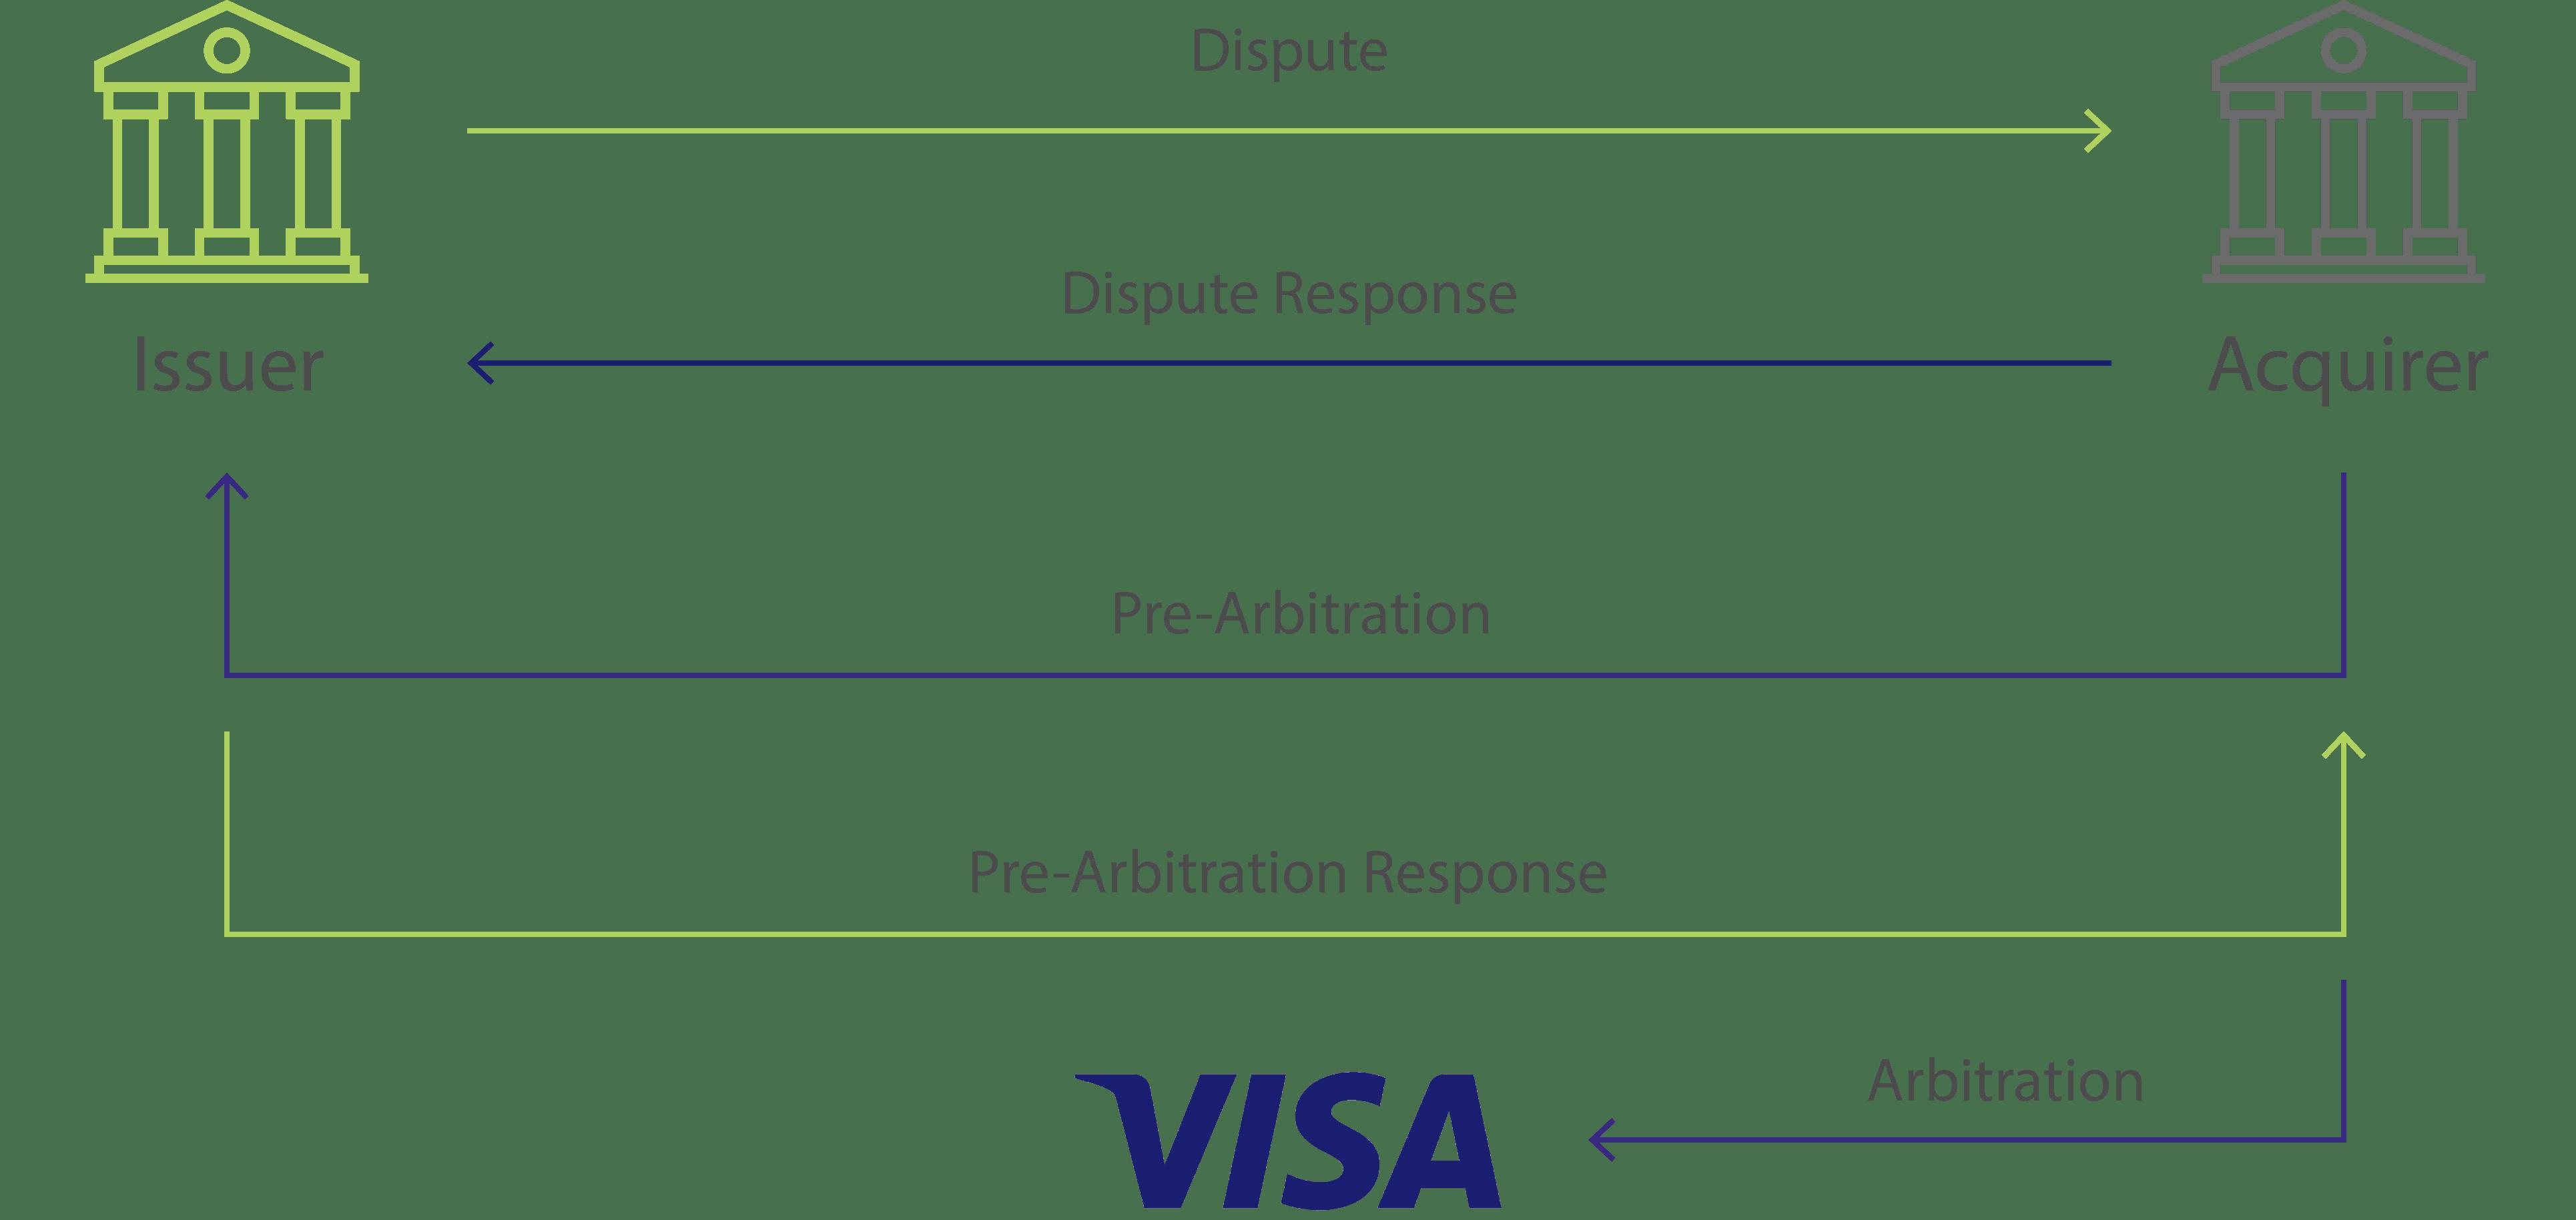 allocation-flowchart